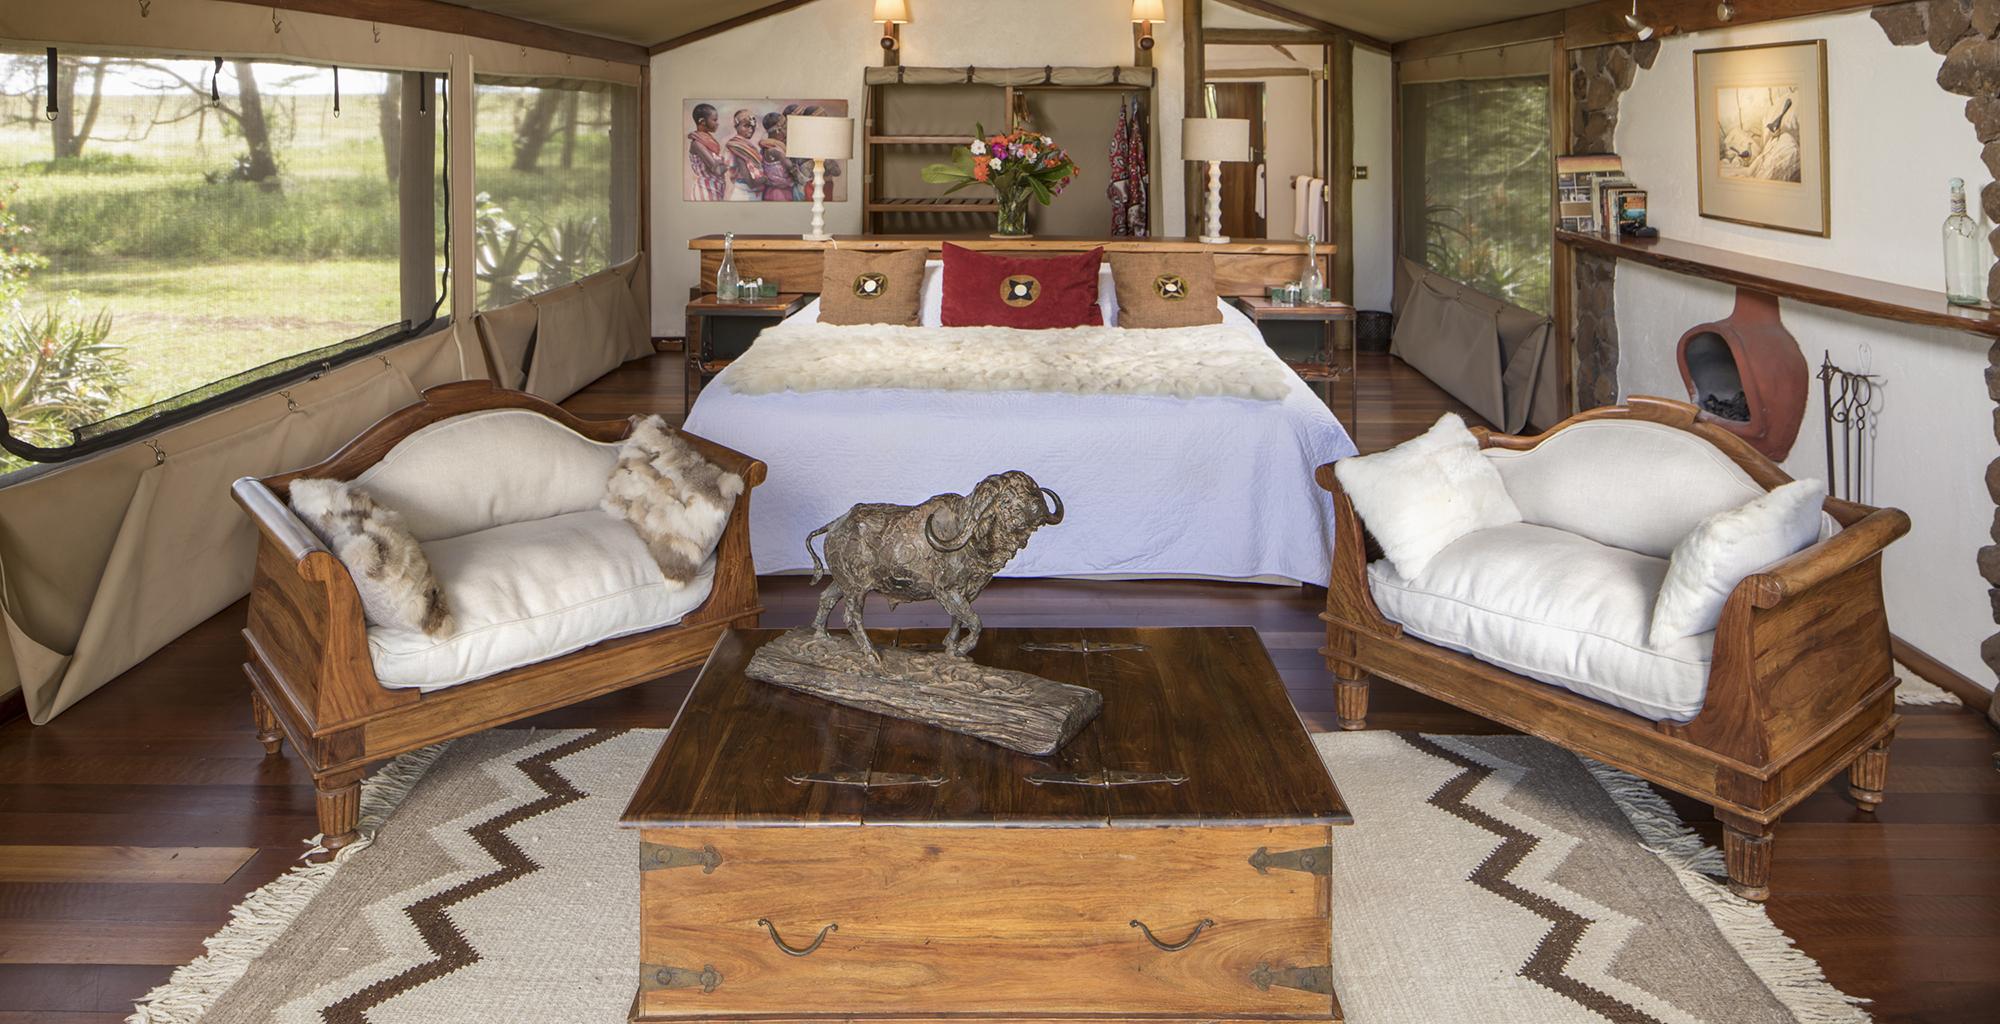 Kenya-Sirikoi-Willies-Camp-Bedroom